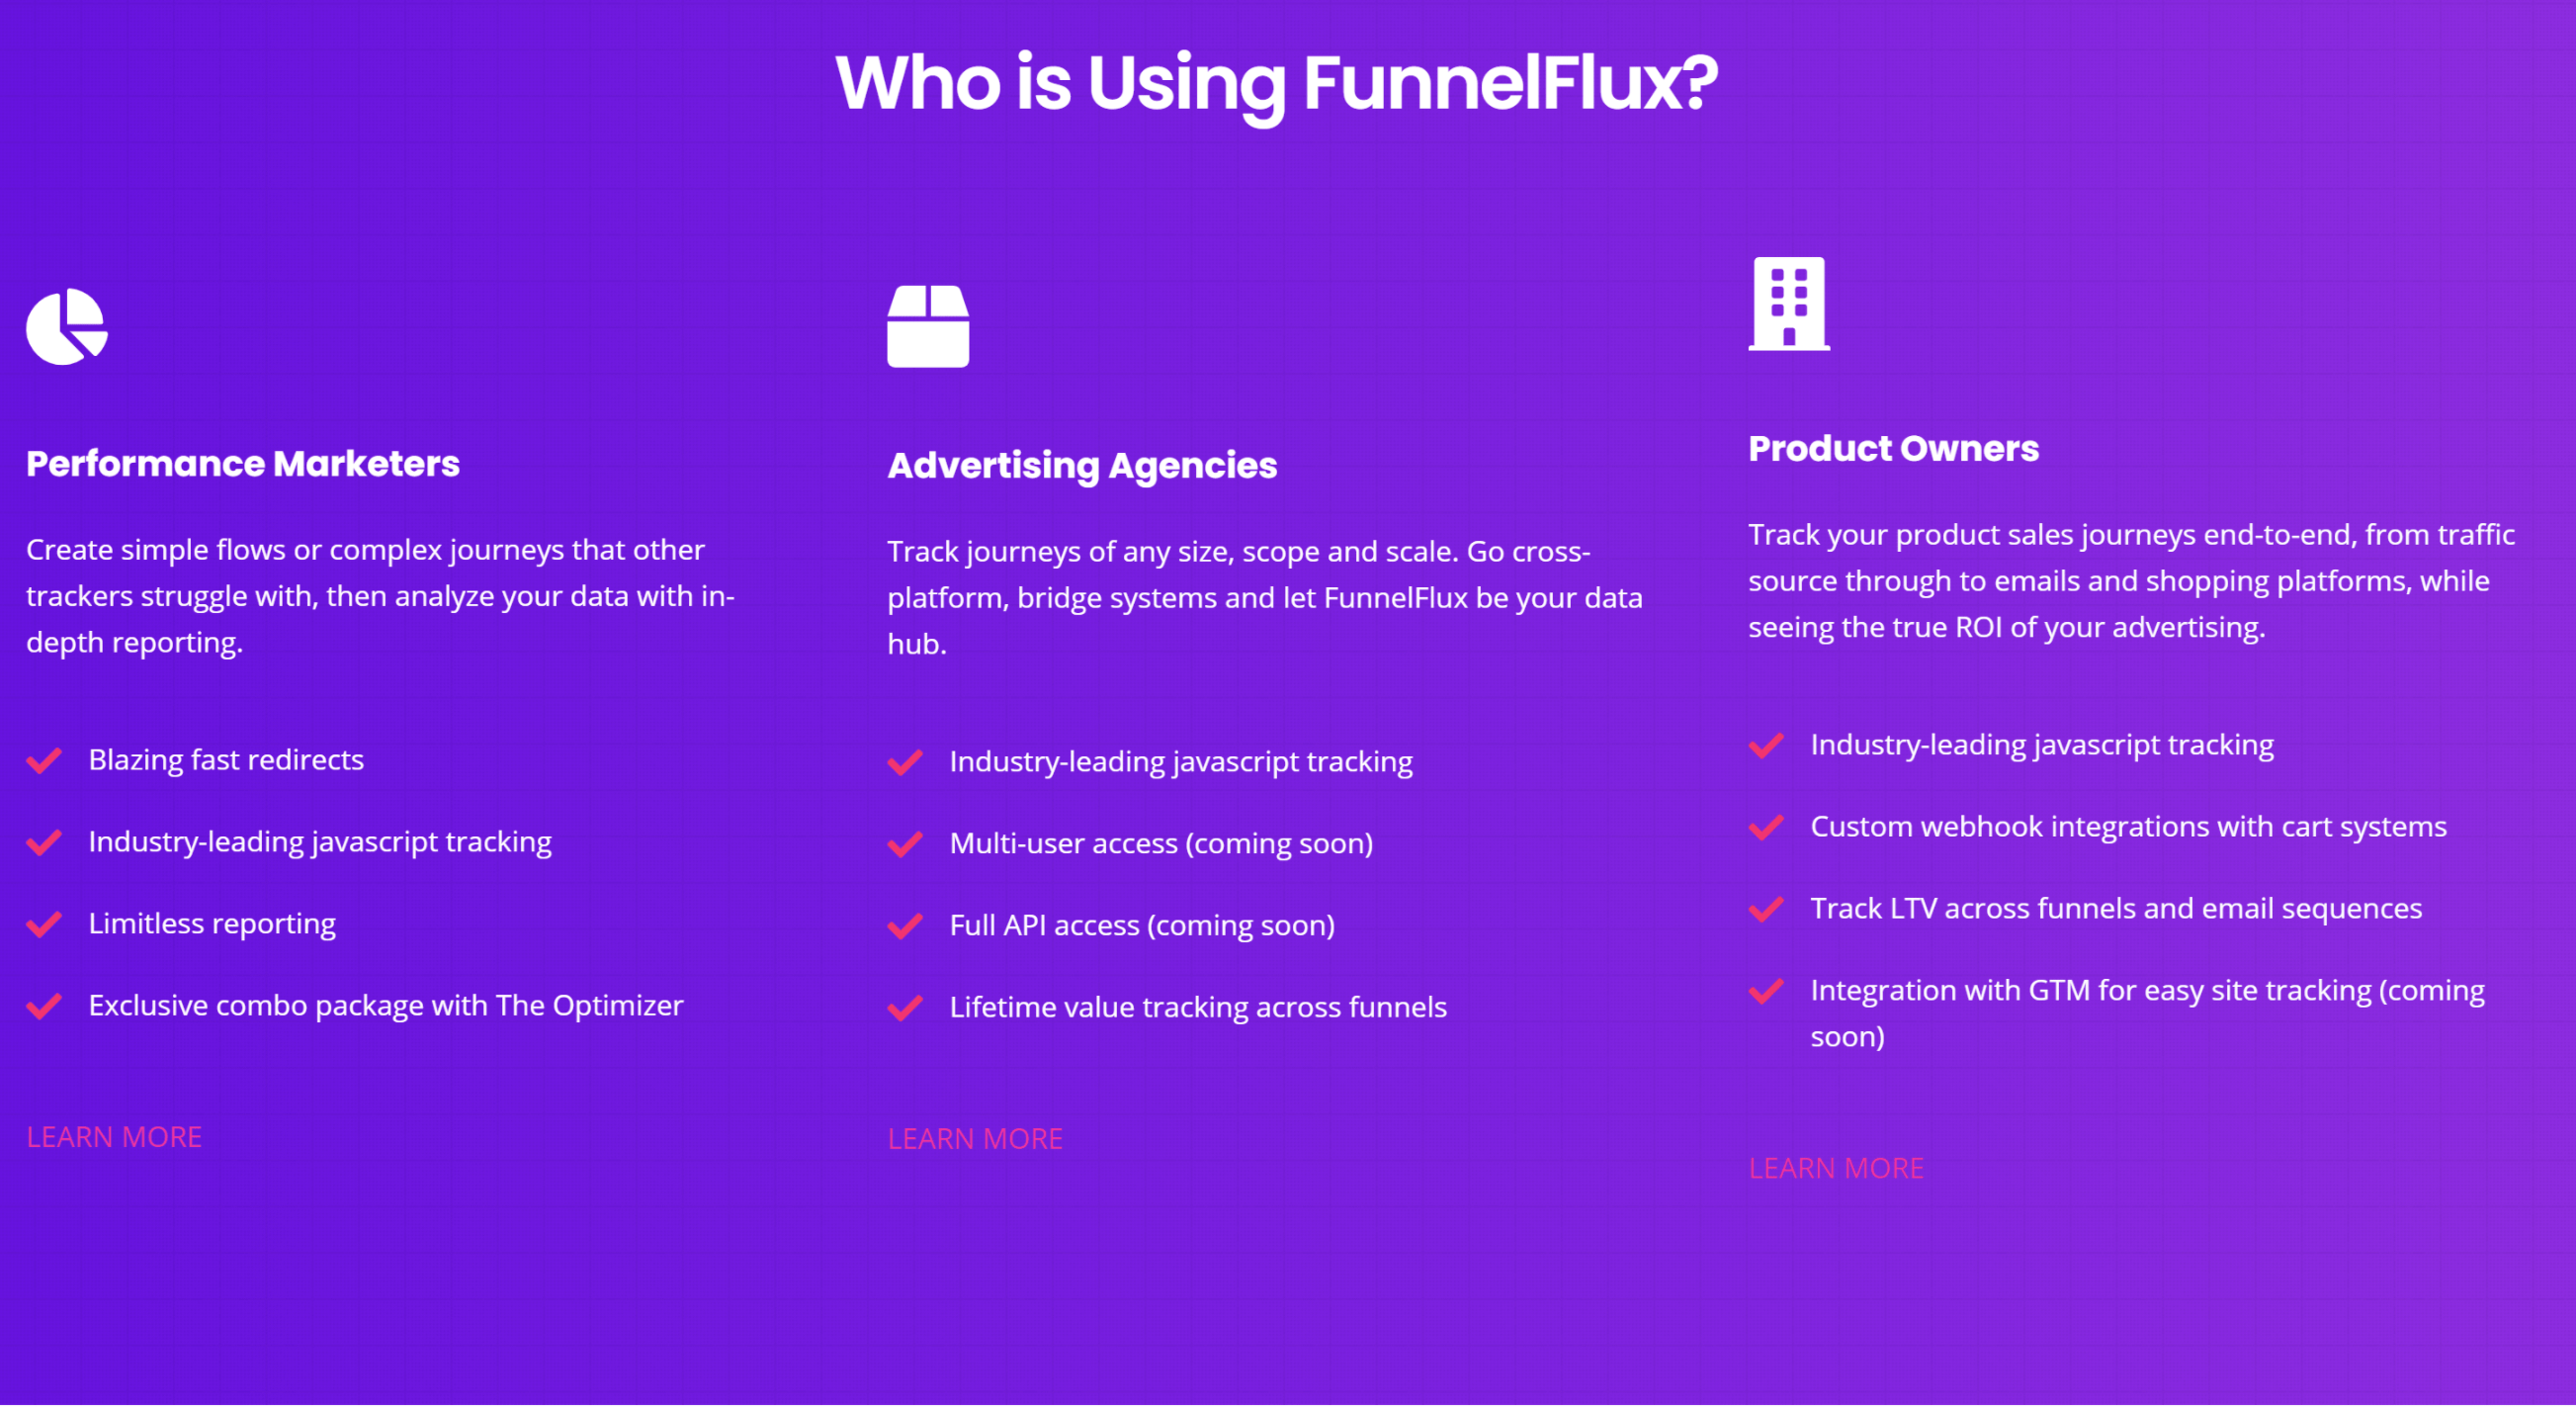 FunnelFlux pro features